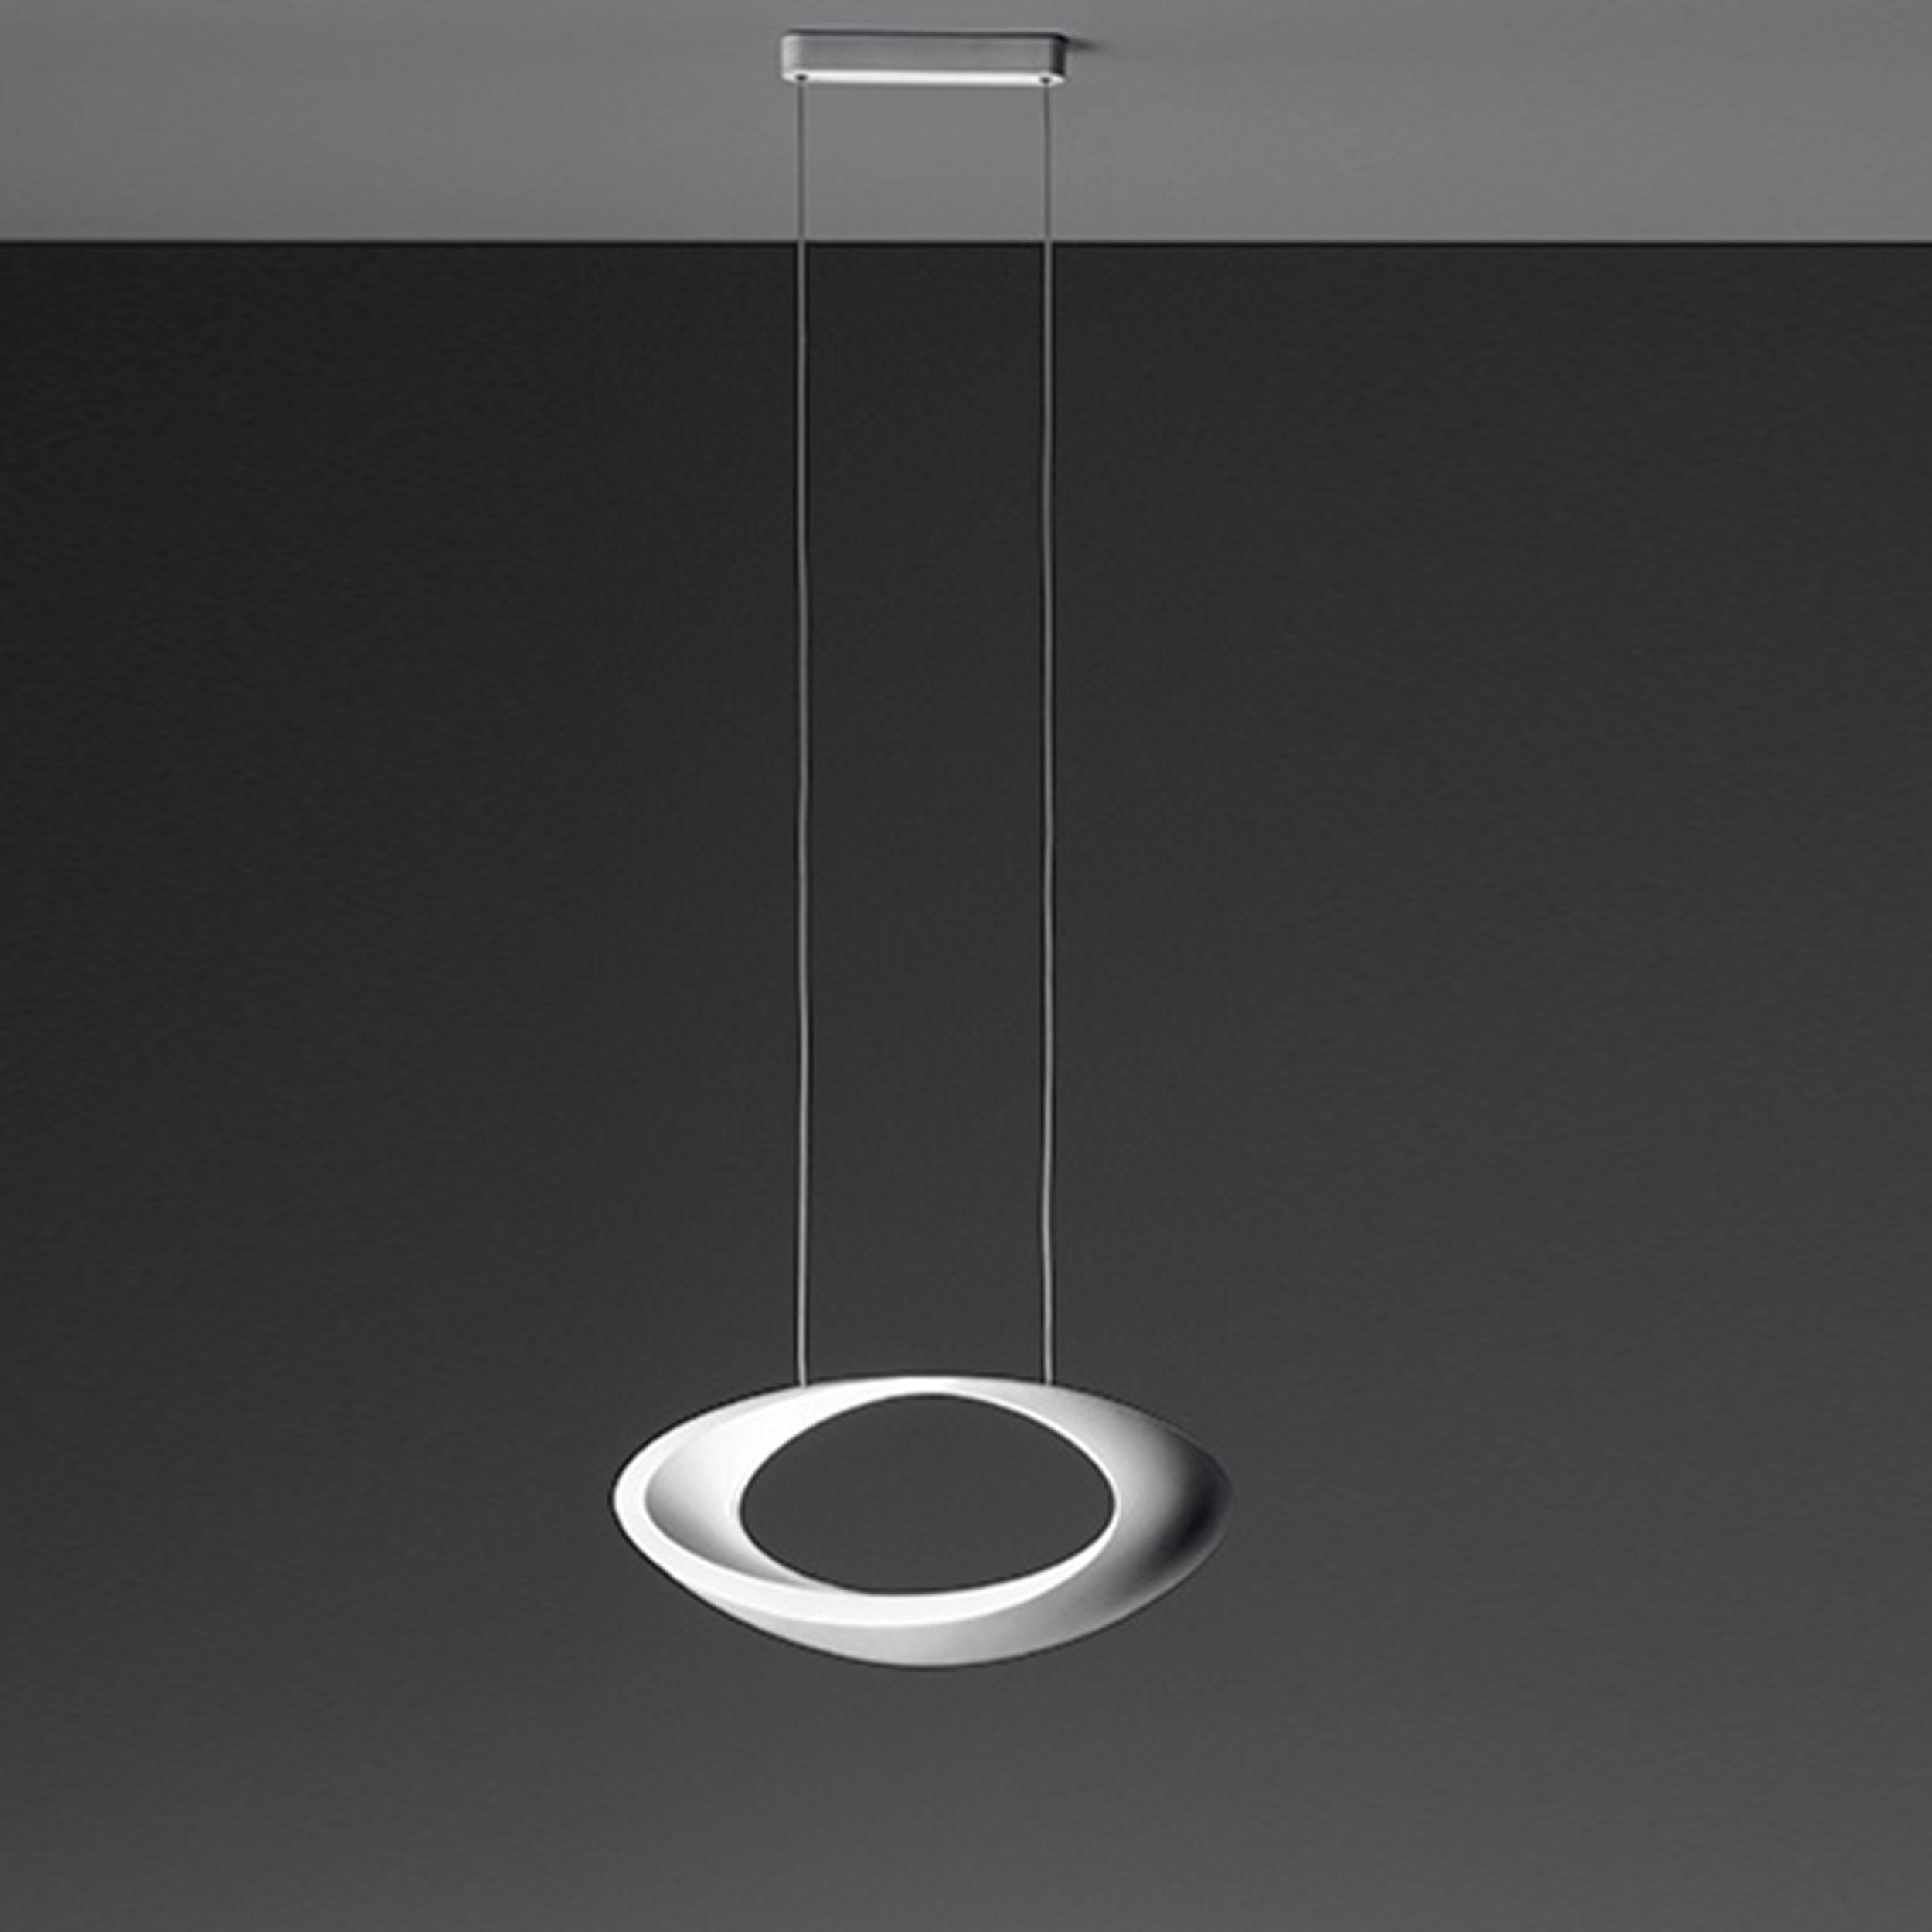 Cabildo LED Pendelleuchte